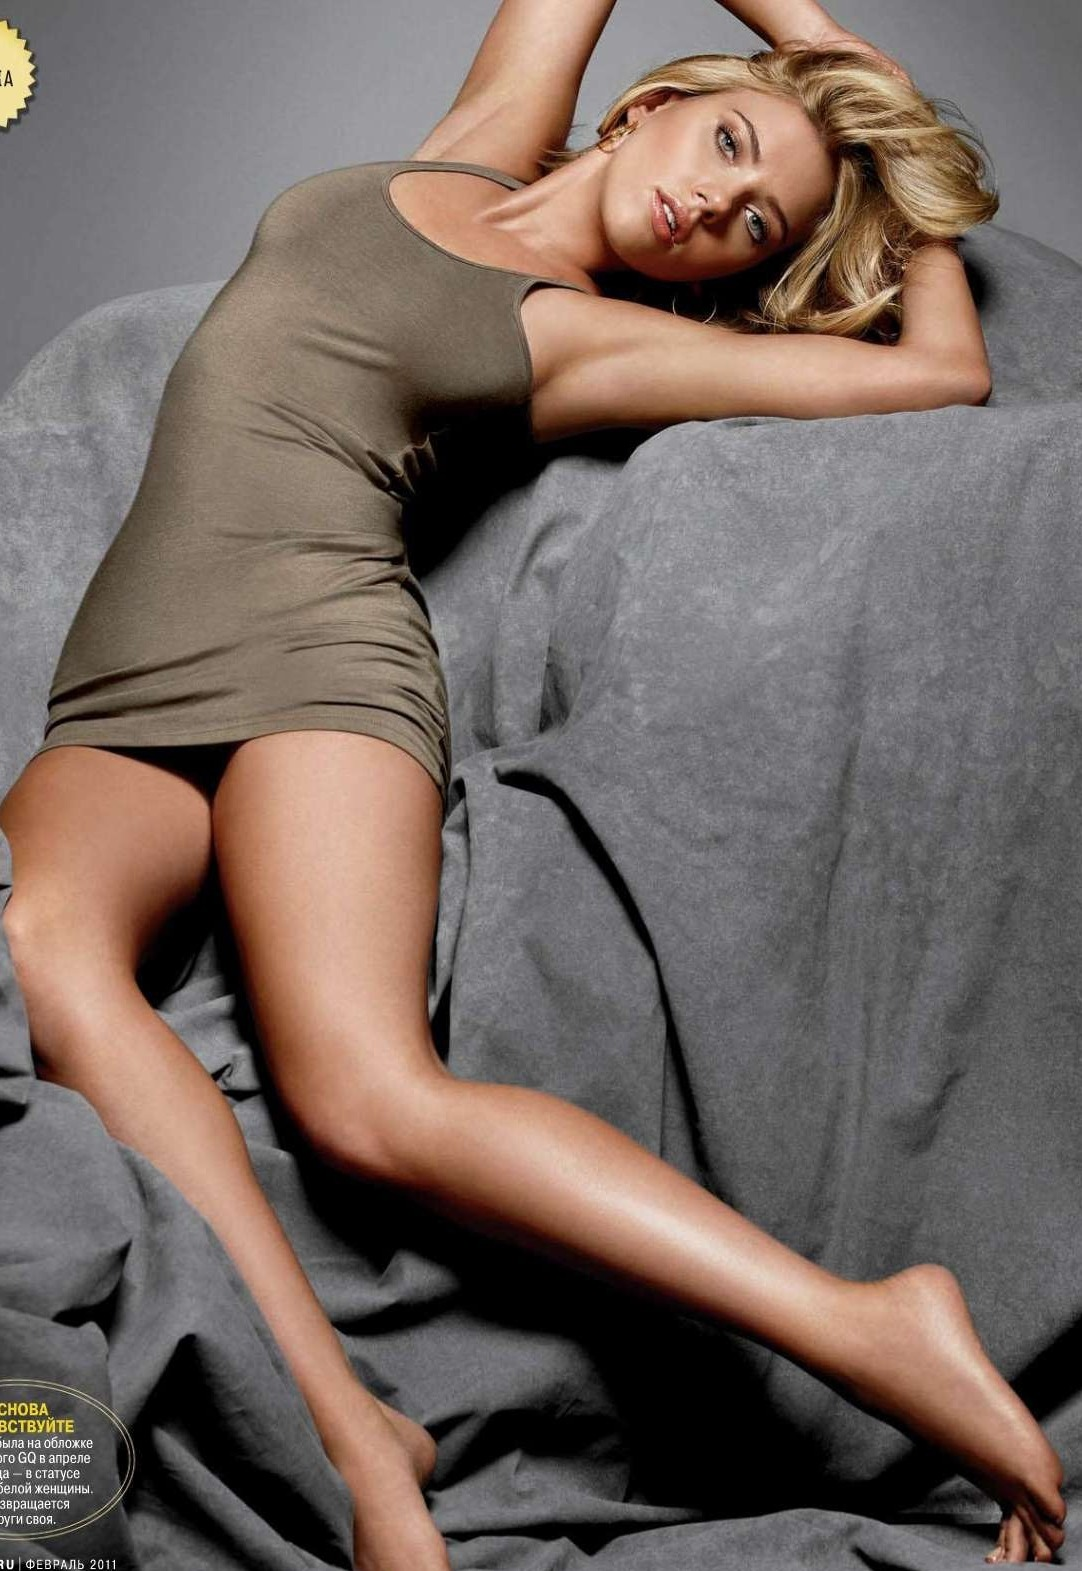 Test scarlett johansson hot photos american actress and - Scarlett johansson blogspot ...